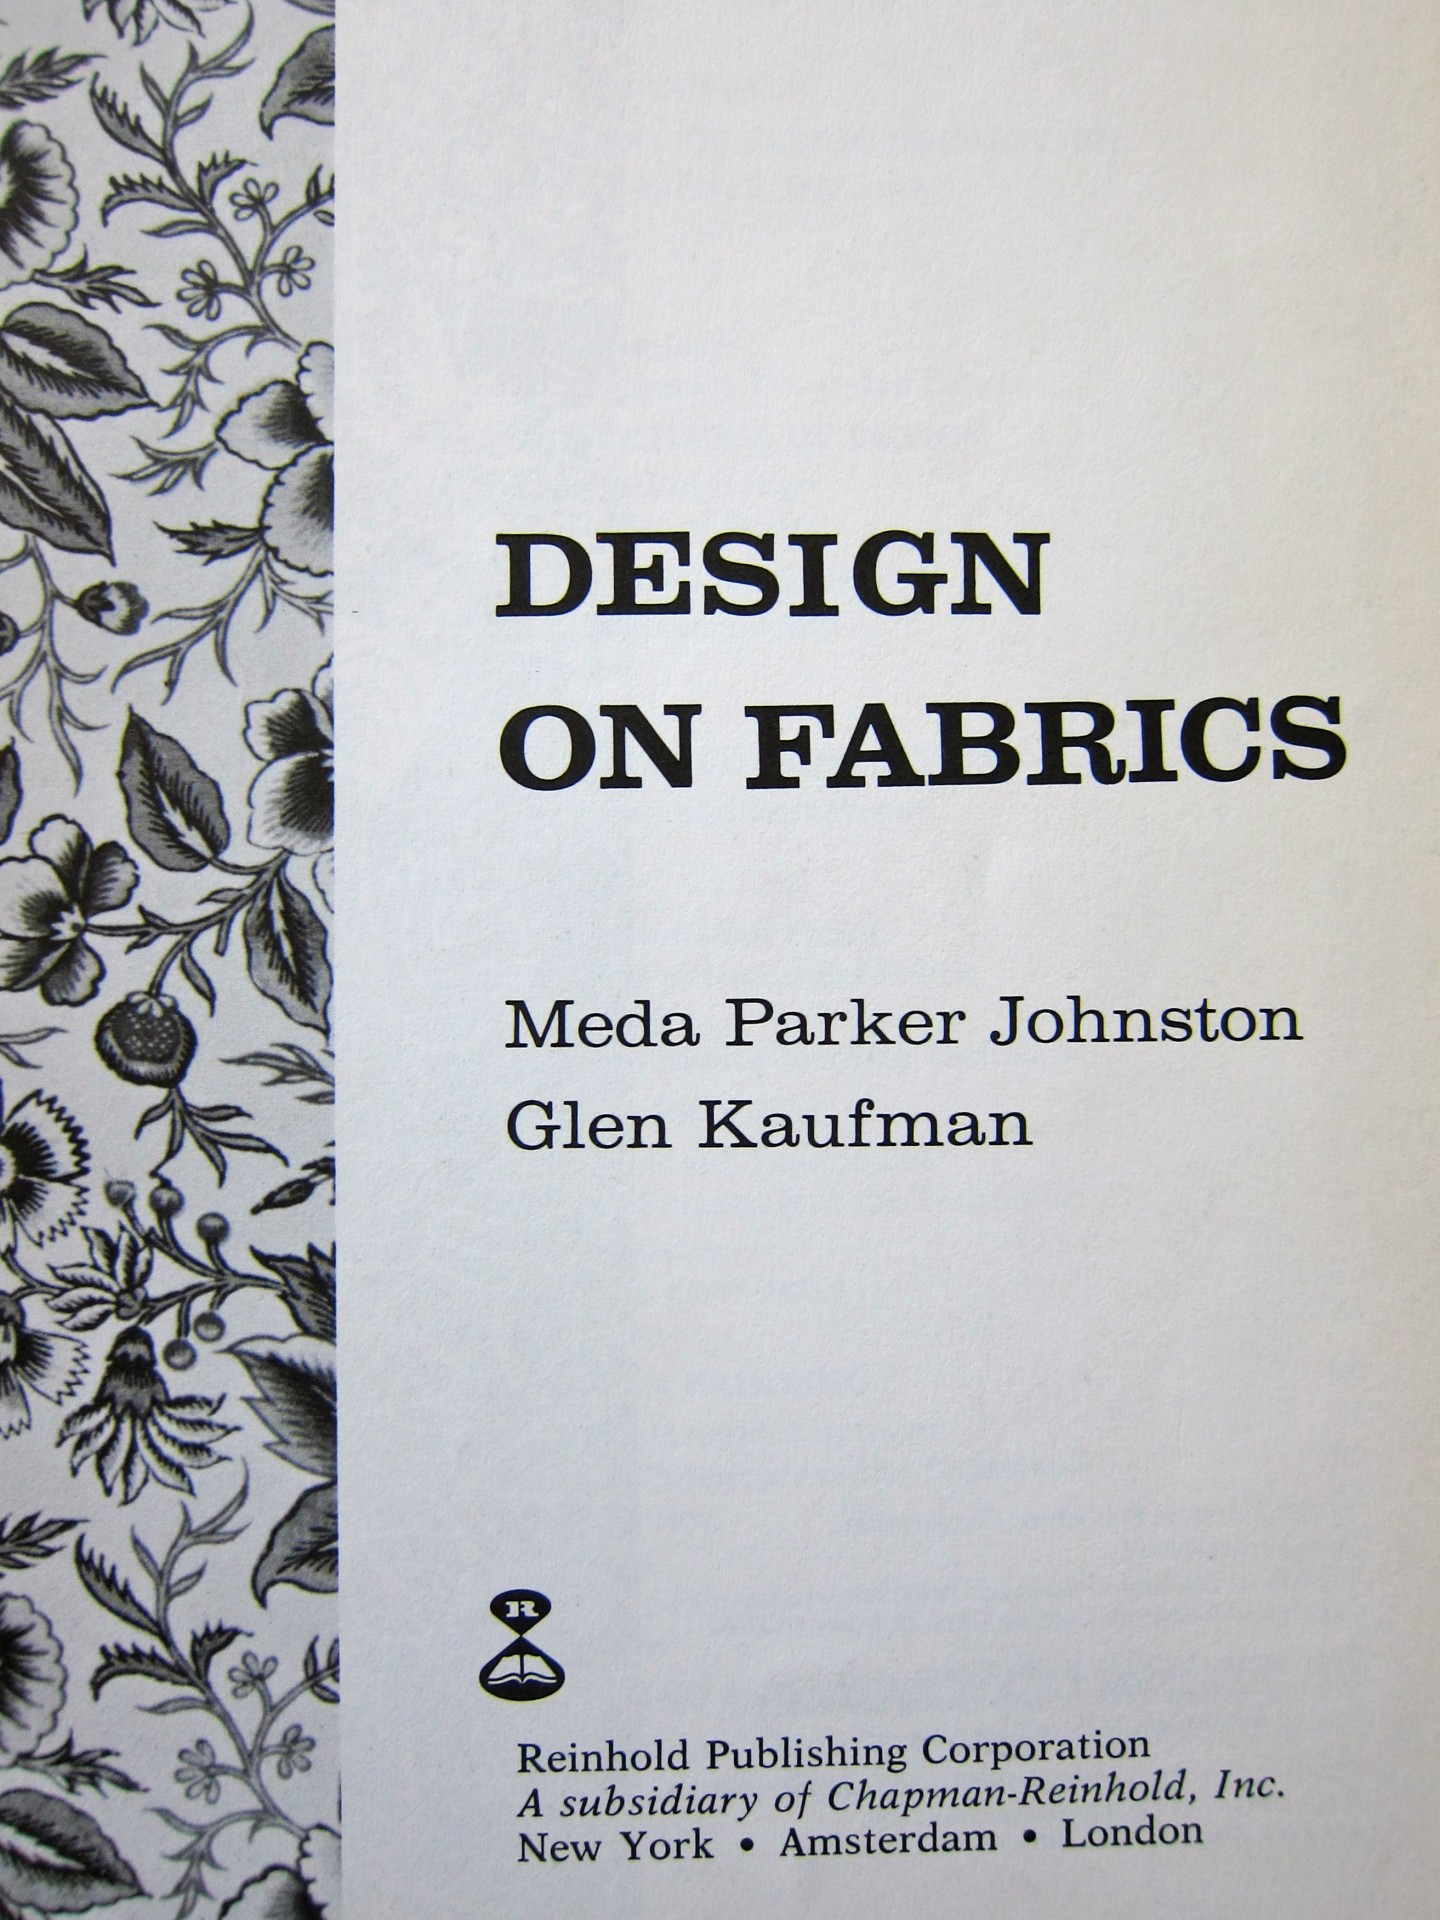 design on fabrics title page elaine lipson art design on fabrics title page